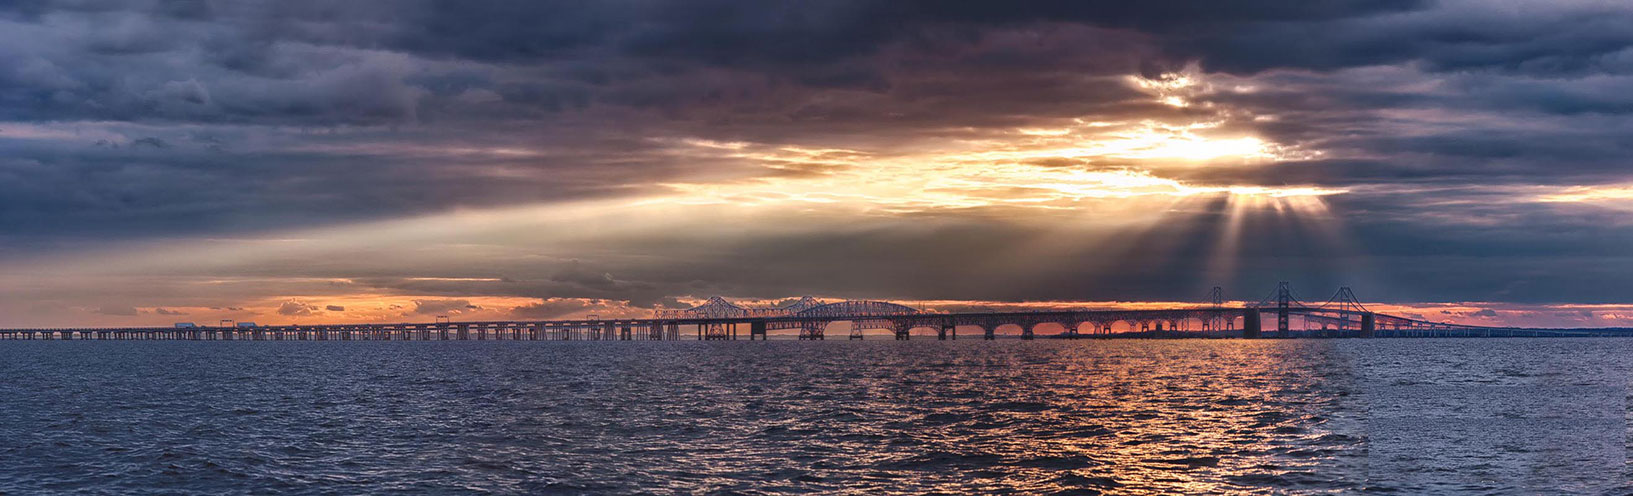 bay_bridge